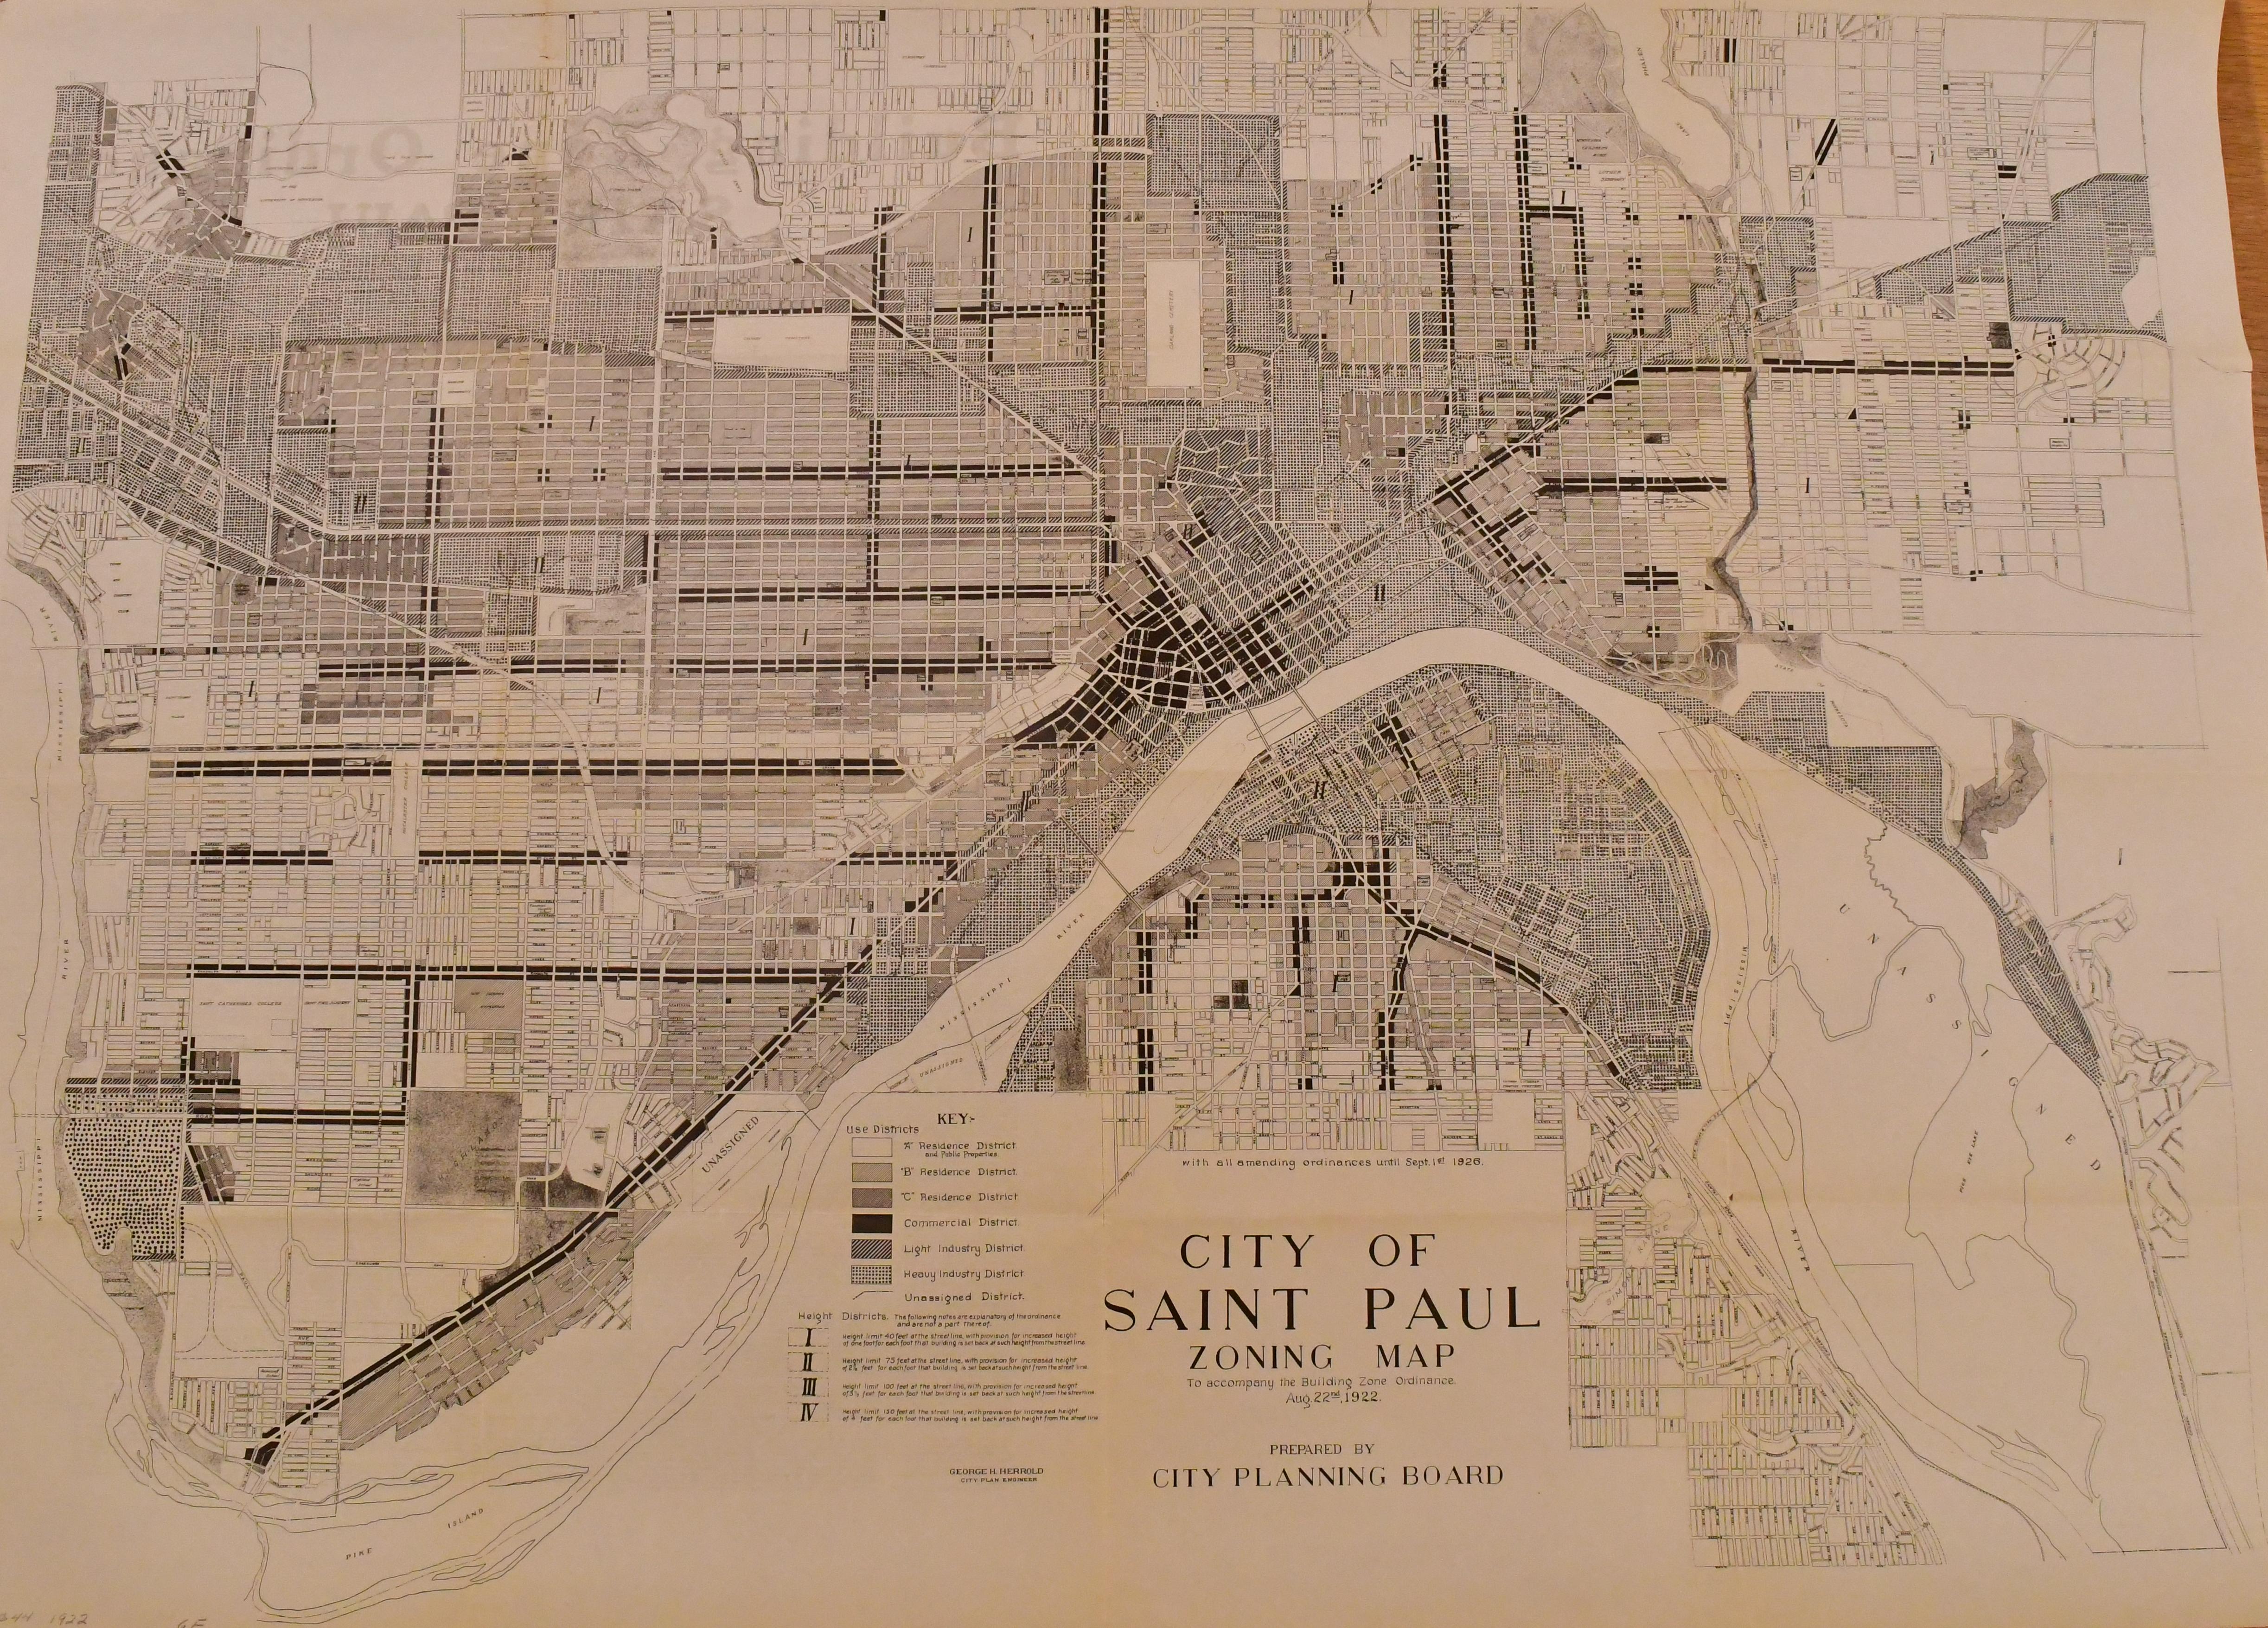 Saint Paul's 1922 zoning map (MN Historical Society)